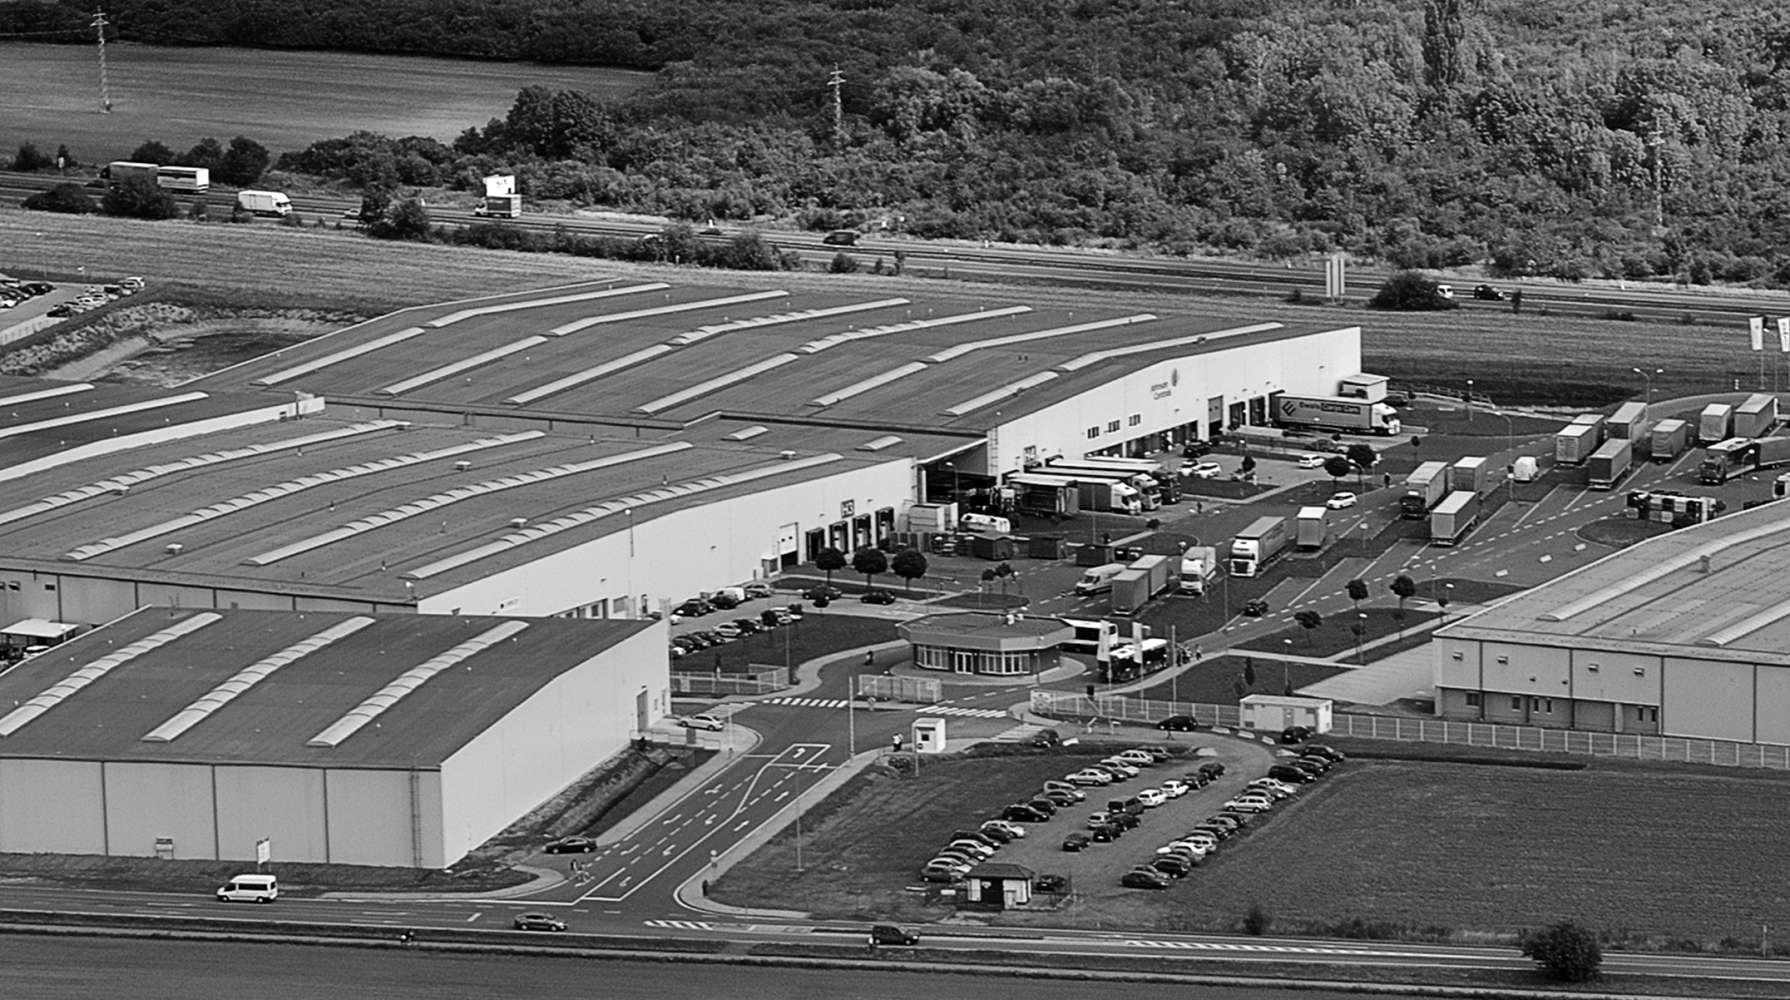 Industrial and logistics Mlada boleslav - bezdecin,  - UNO Park Mladá Boleslav - Bezděčín - 36